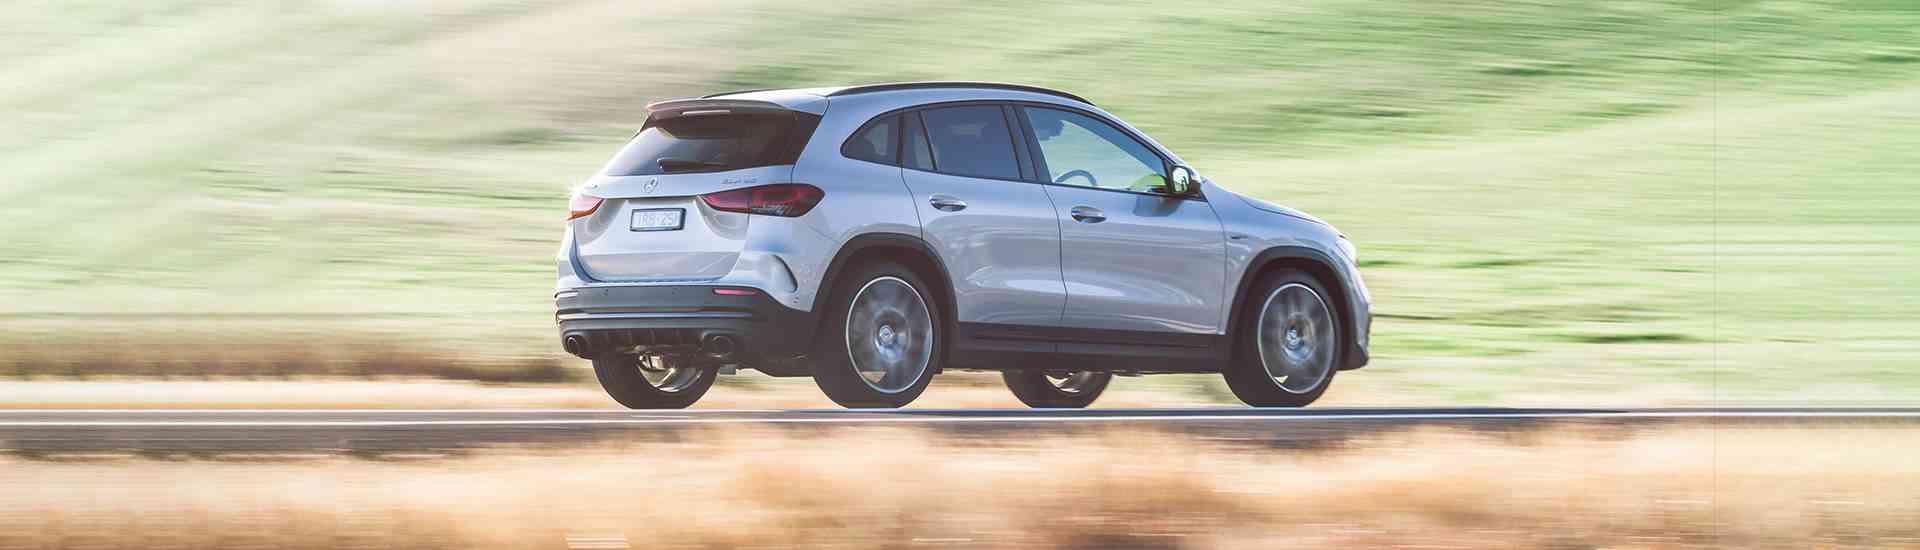 Mercedes-AMG GLA 35 2021 SUV review header